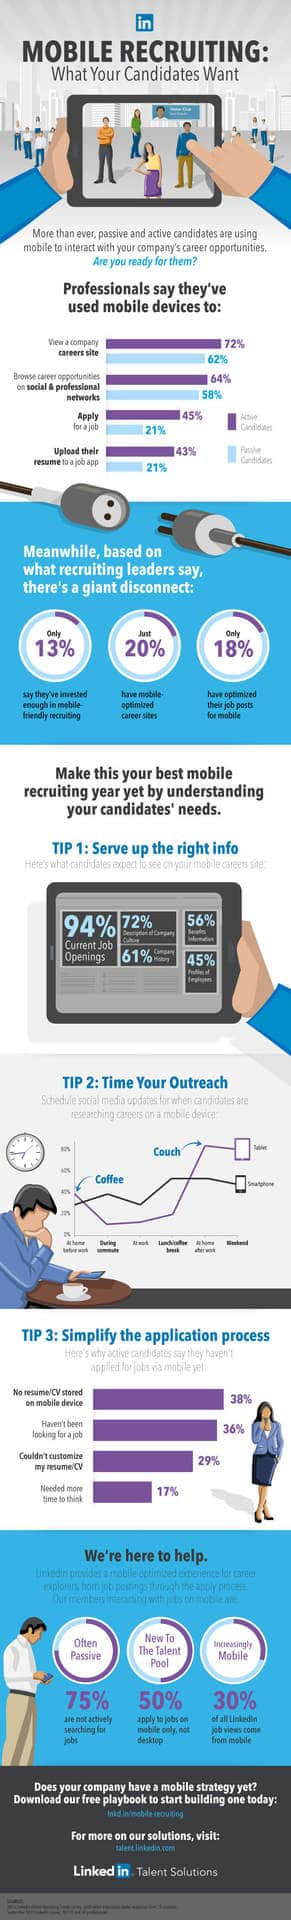 Mobile-Recruiting-Statistics-2014